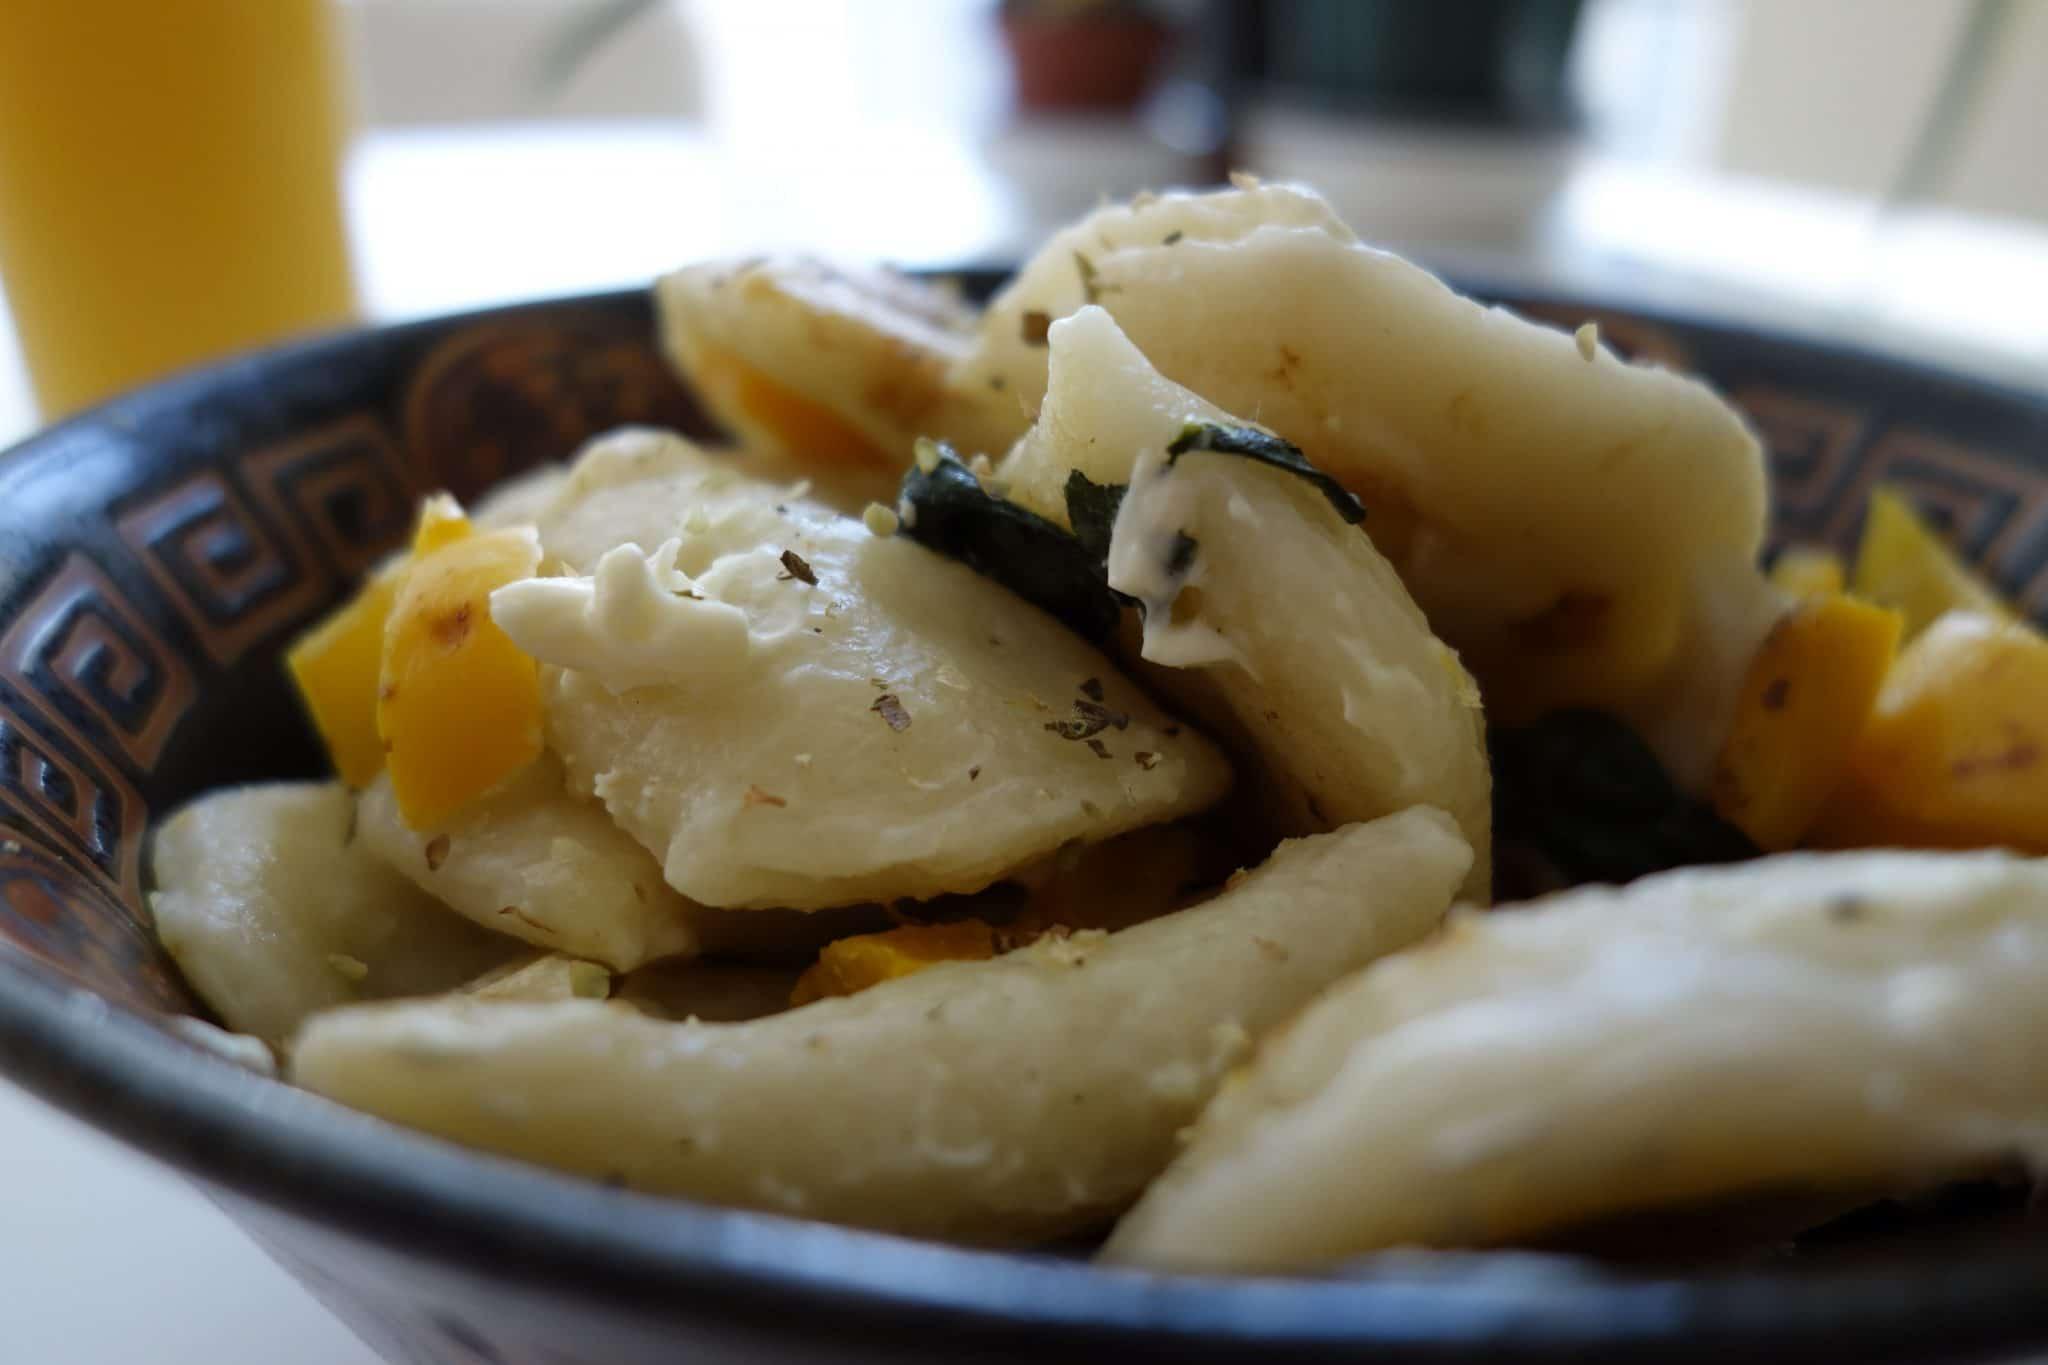 fried ravioli, ravioli dough recipe